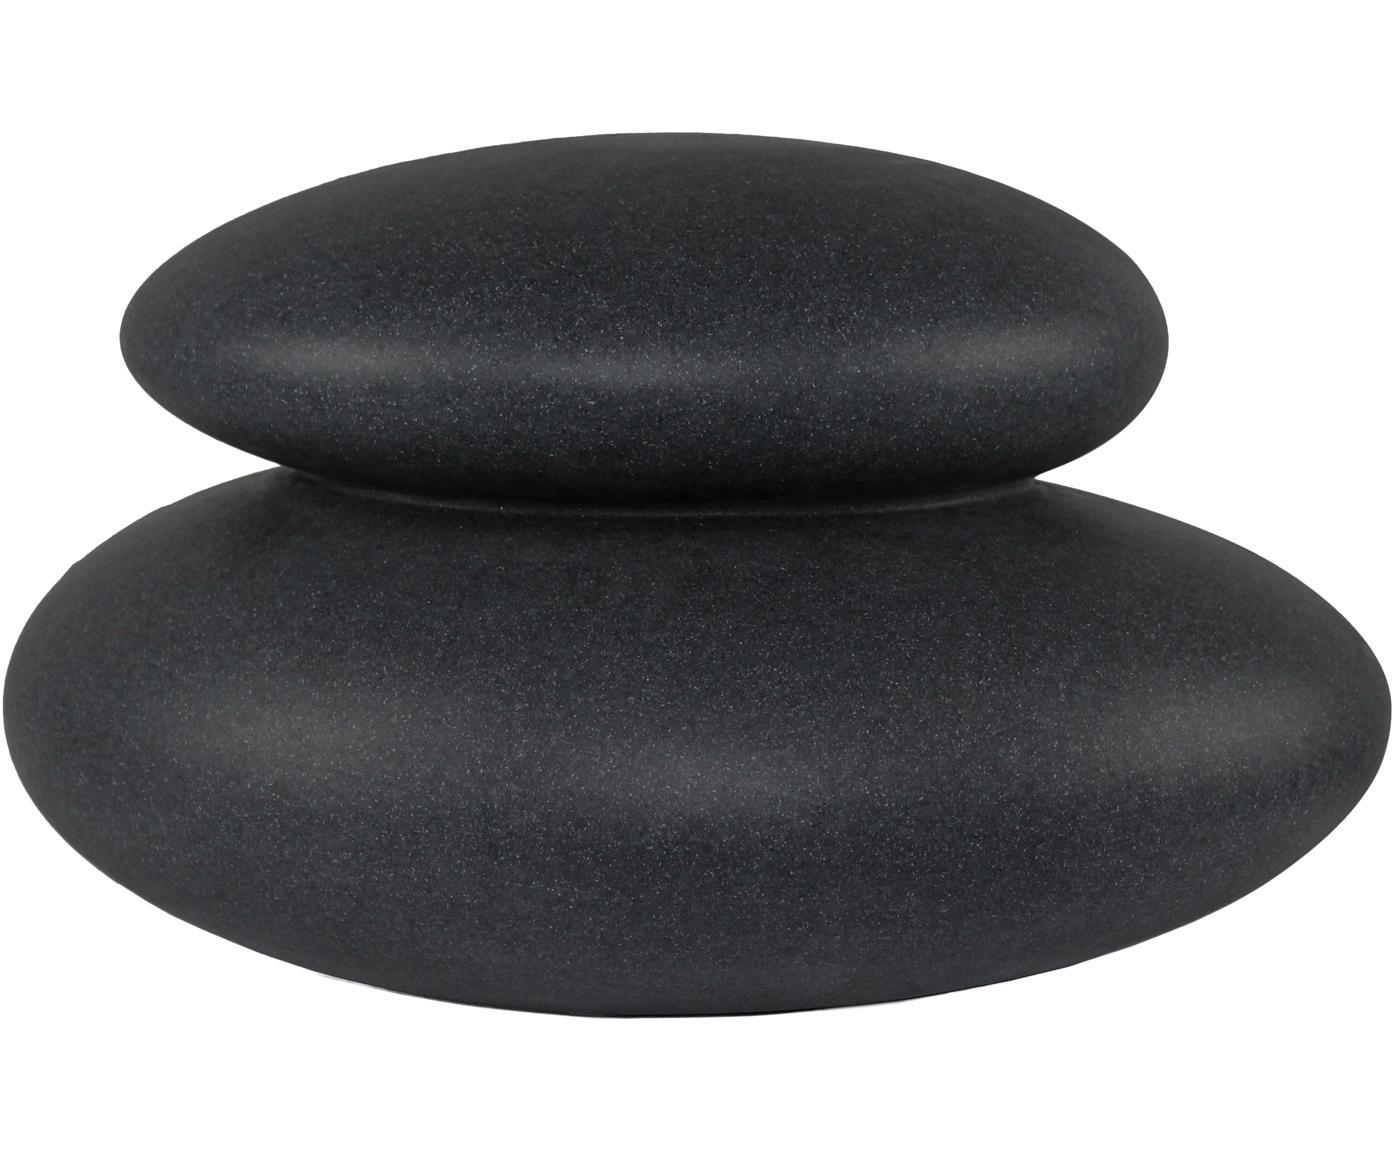 Lámpara de exterior Shining Stone, Plástico, Gris antracita, An 39 x Al 22 cm